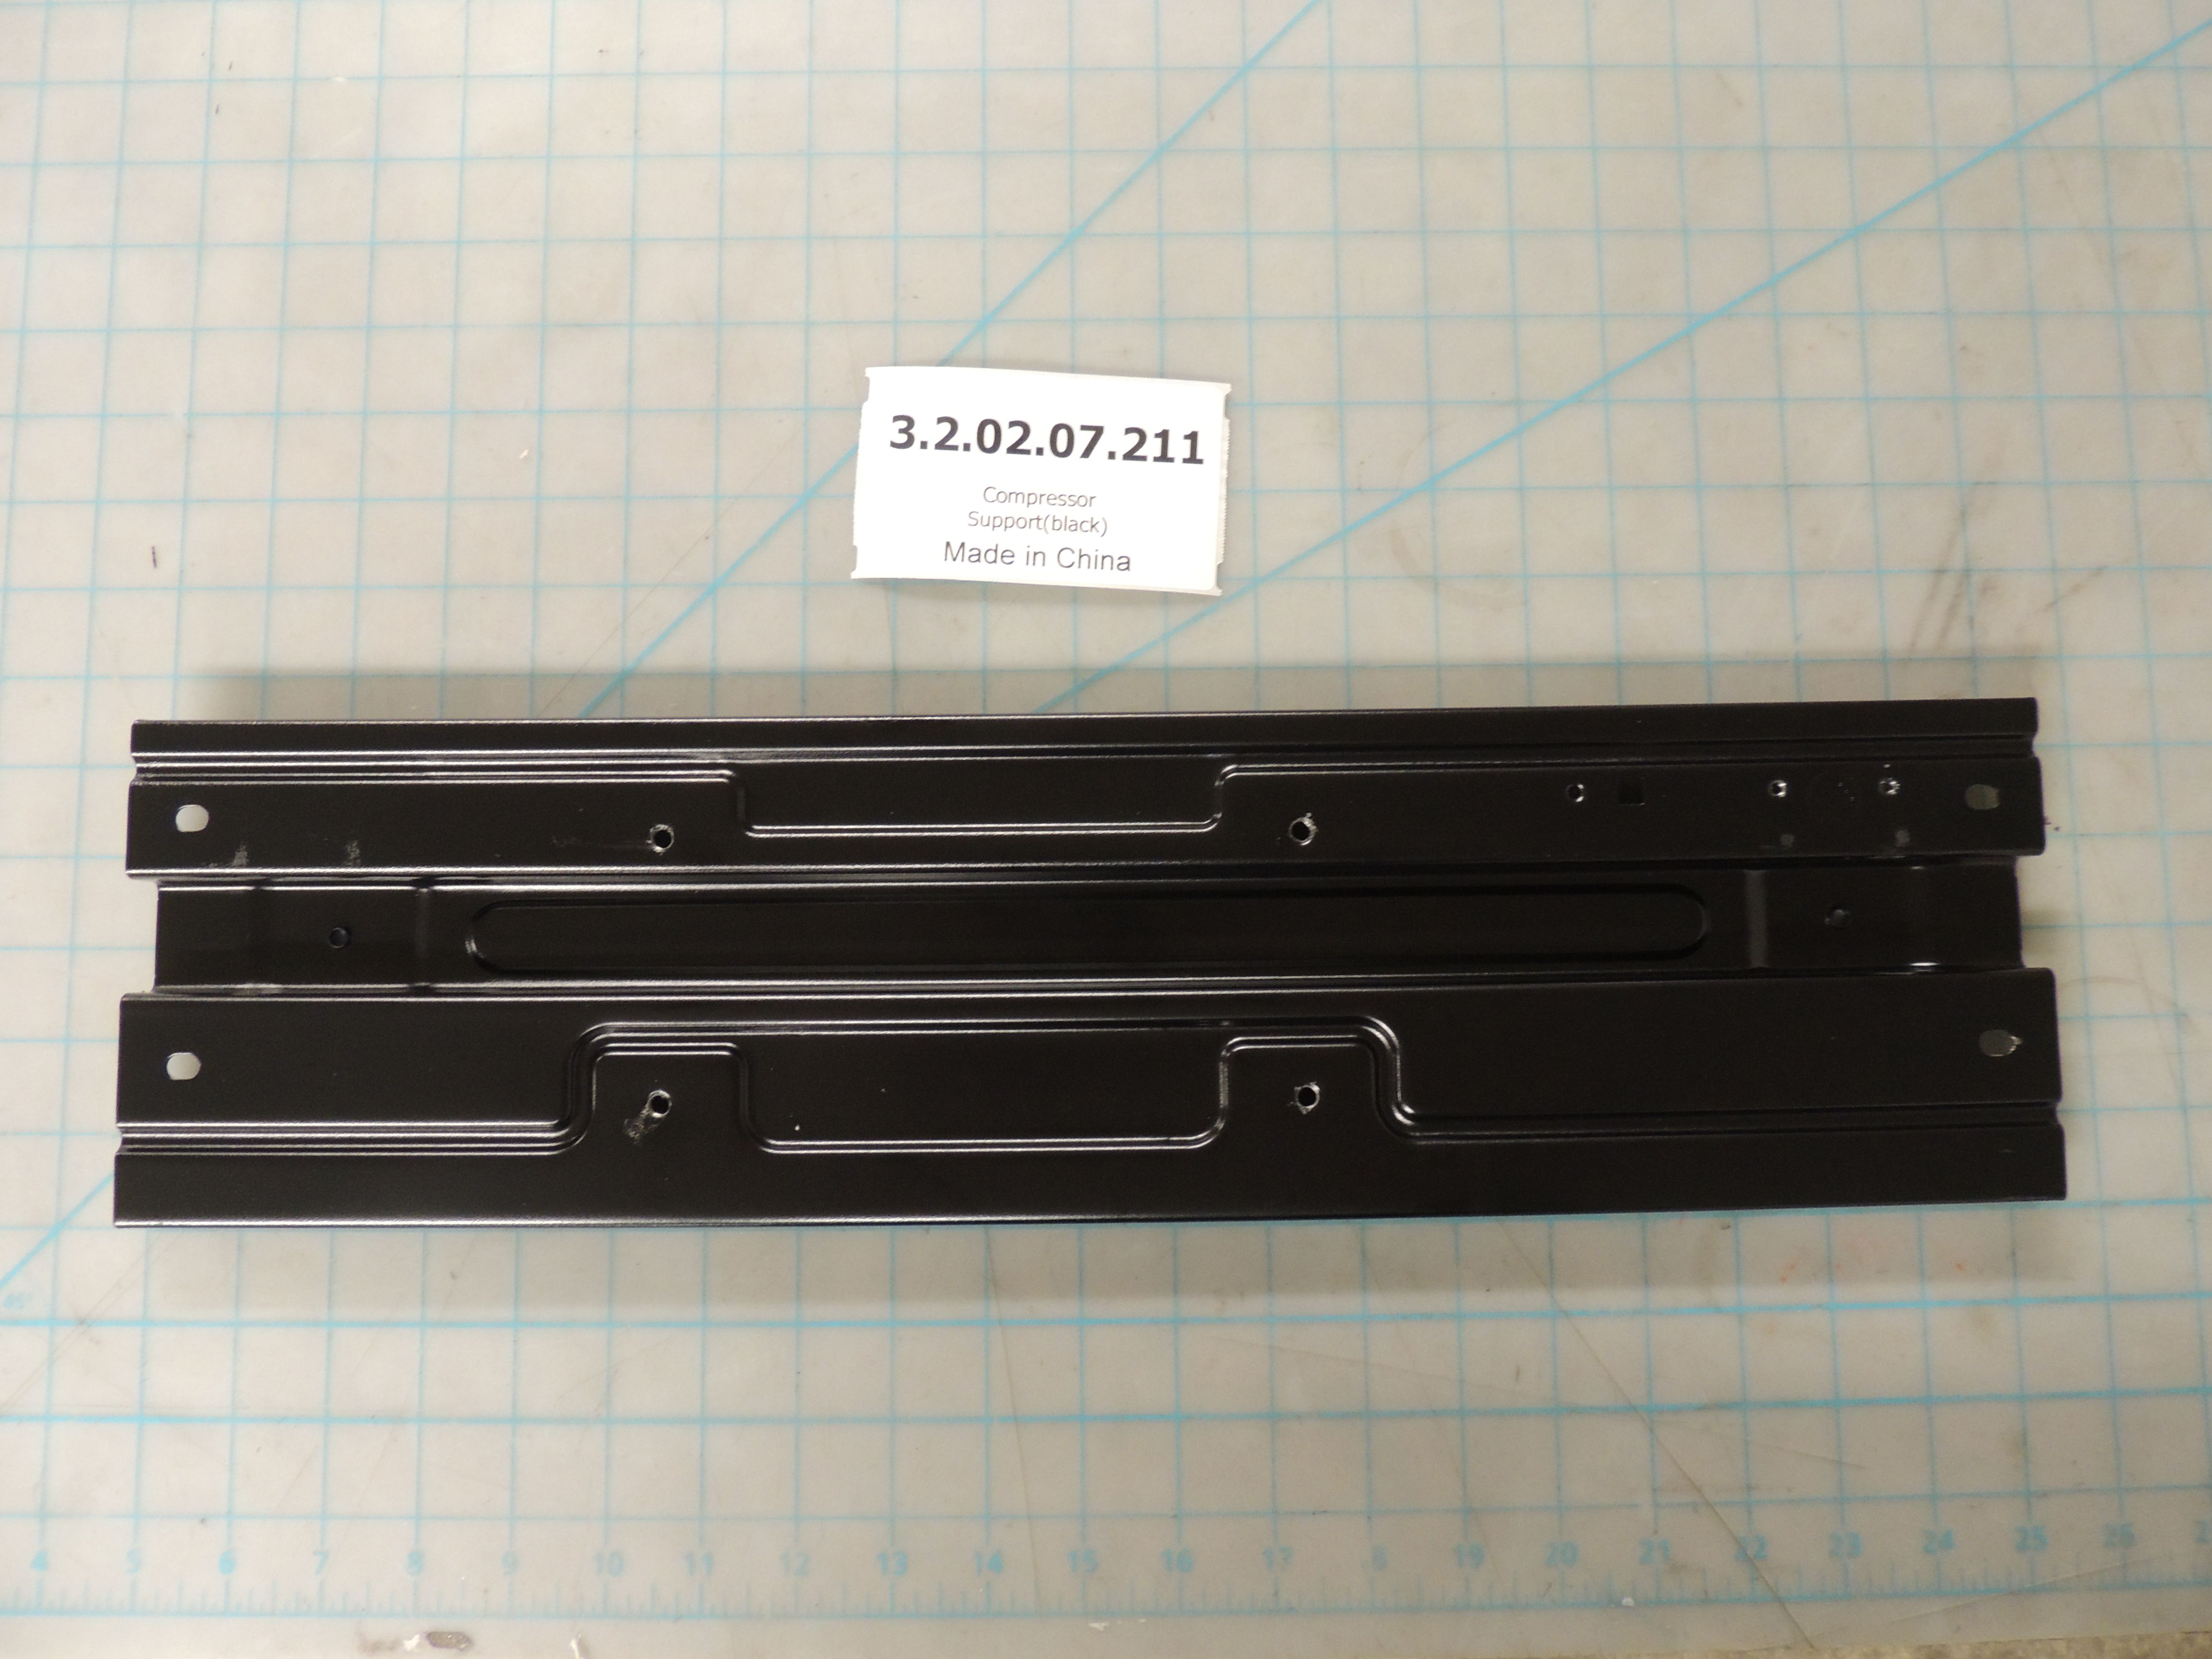 Compressor Support(black)